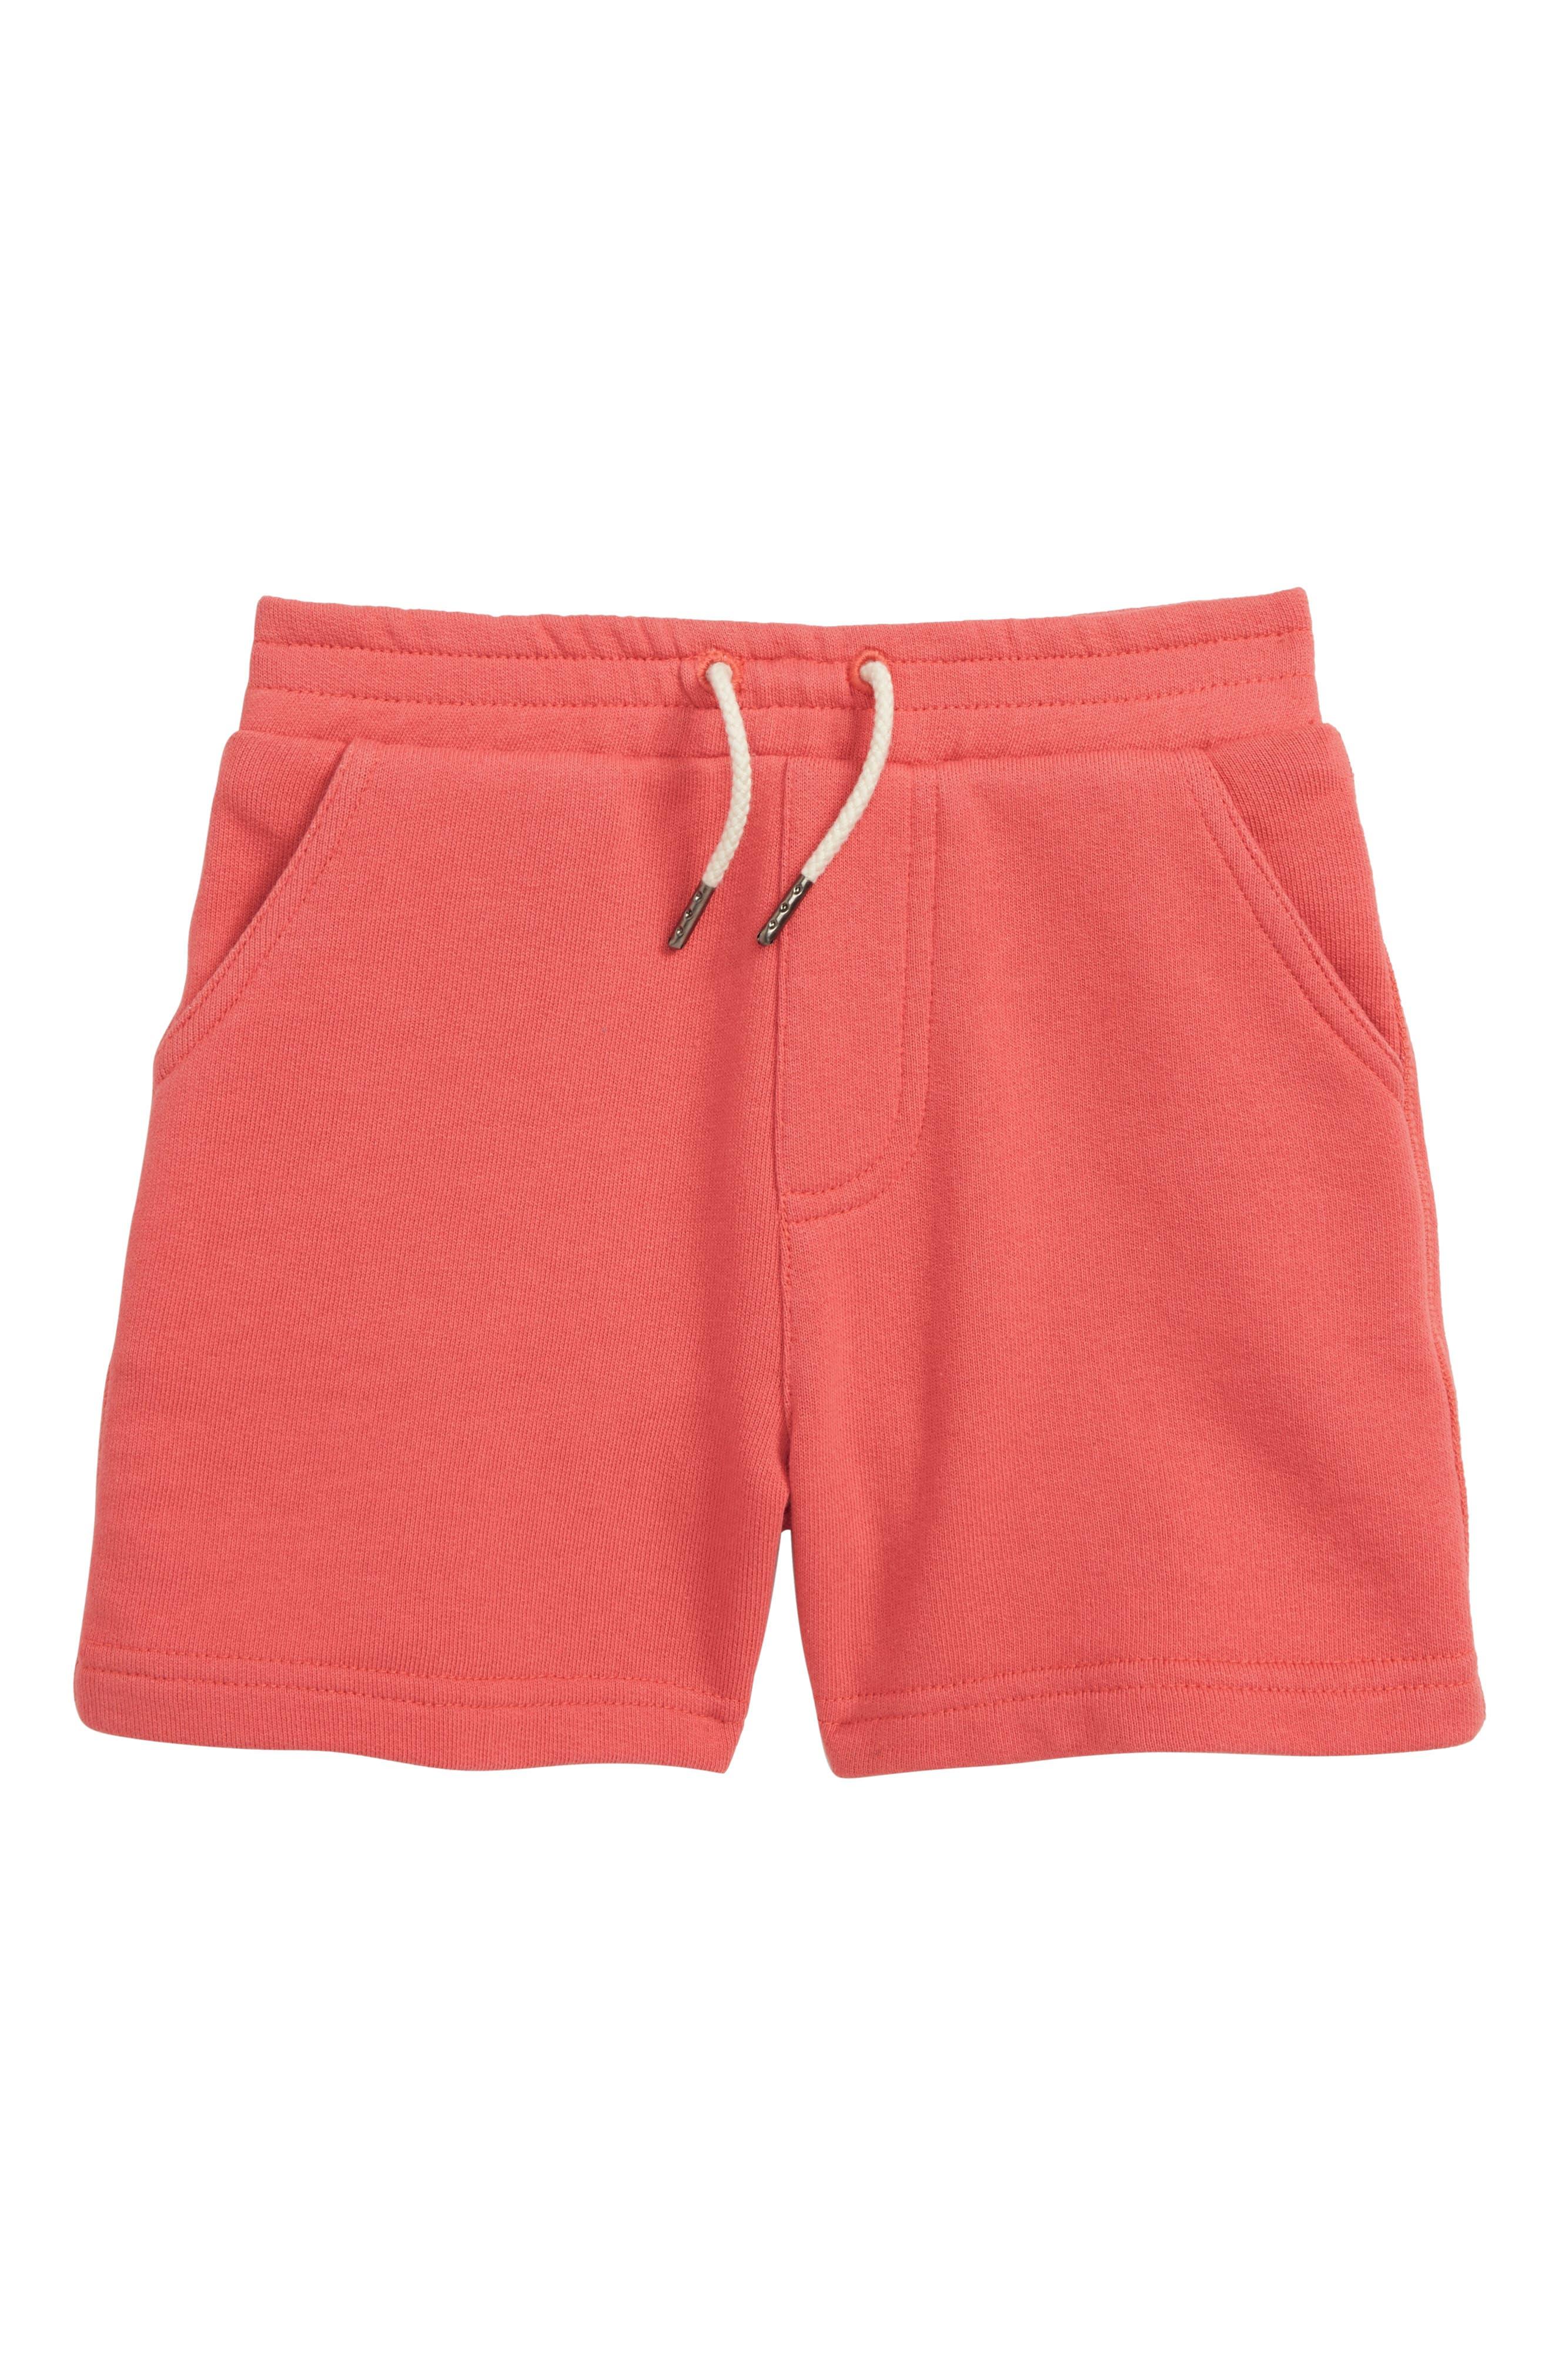 PEEK ESSENTIALS, Even Shorts, Main thumbnail 1, color, RED